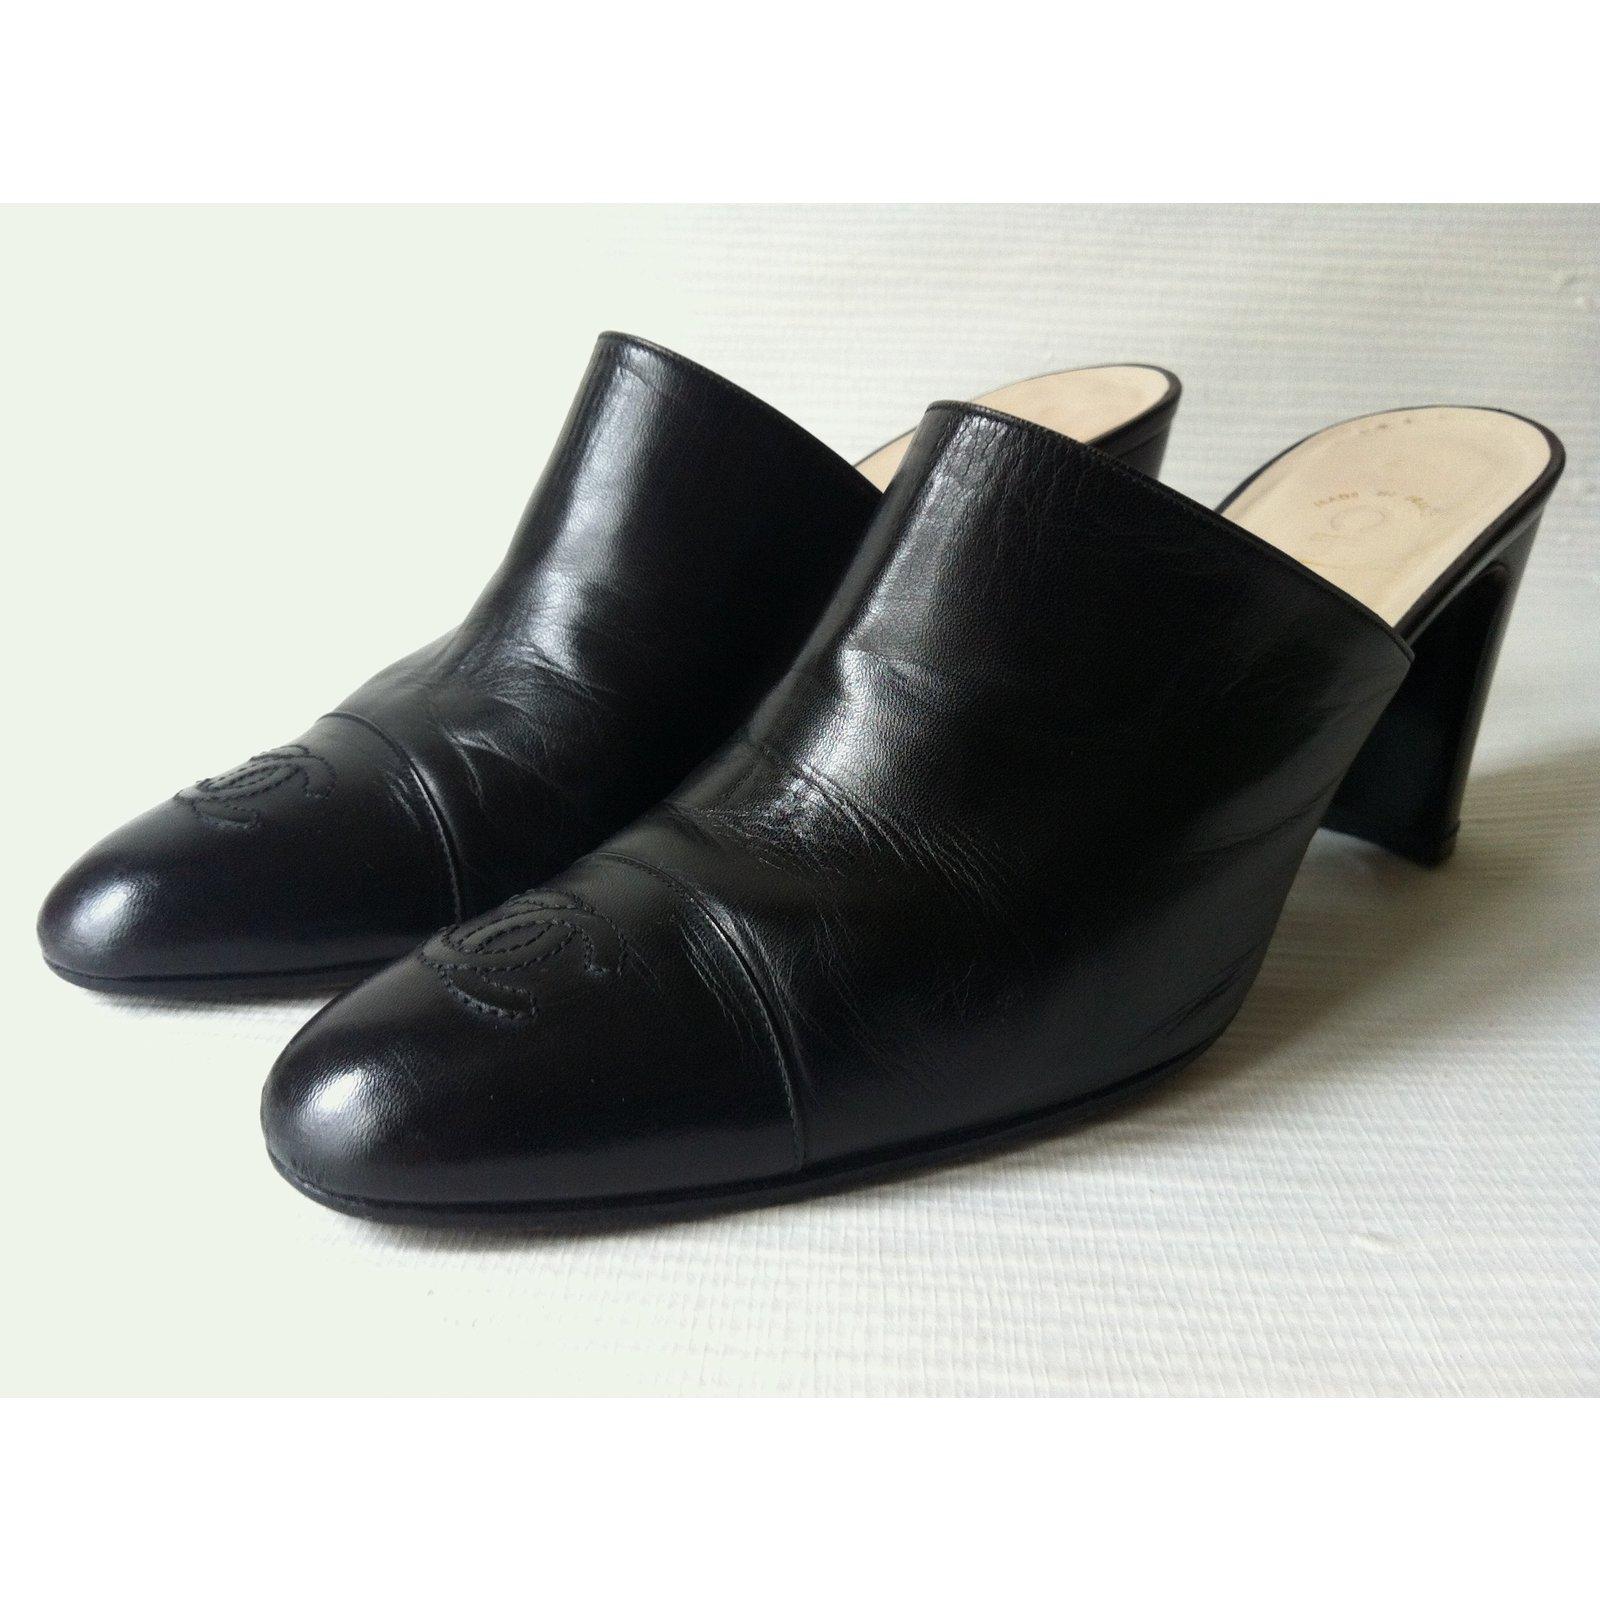 7423288c11ec Chanel Mules Mules Leather Black ref.18470 - Joli Closet